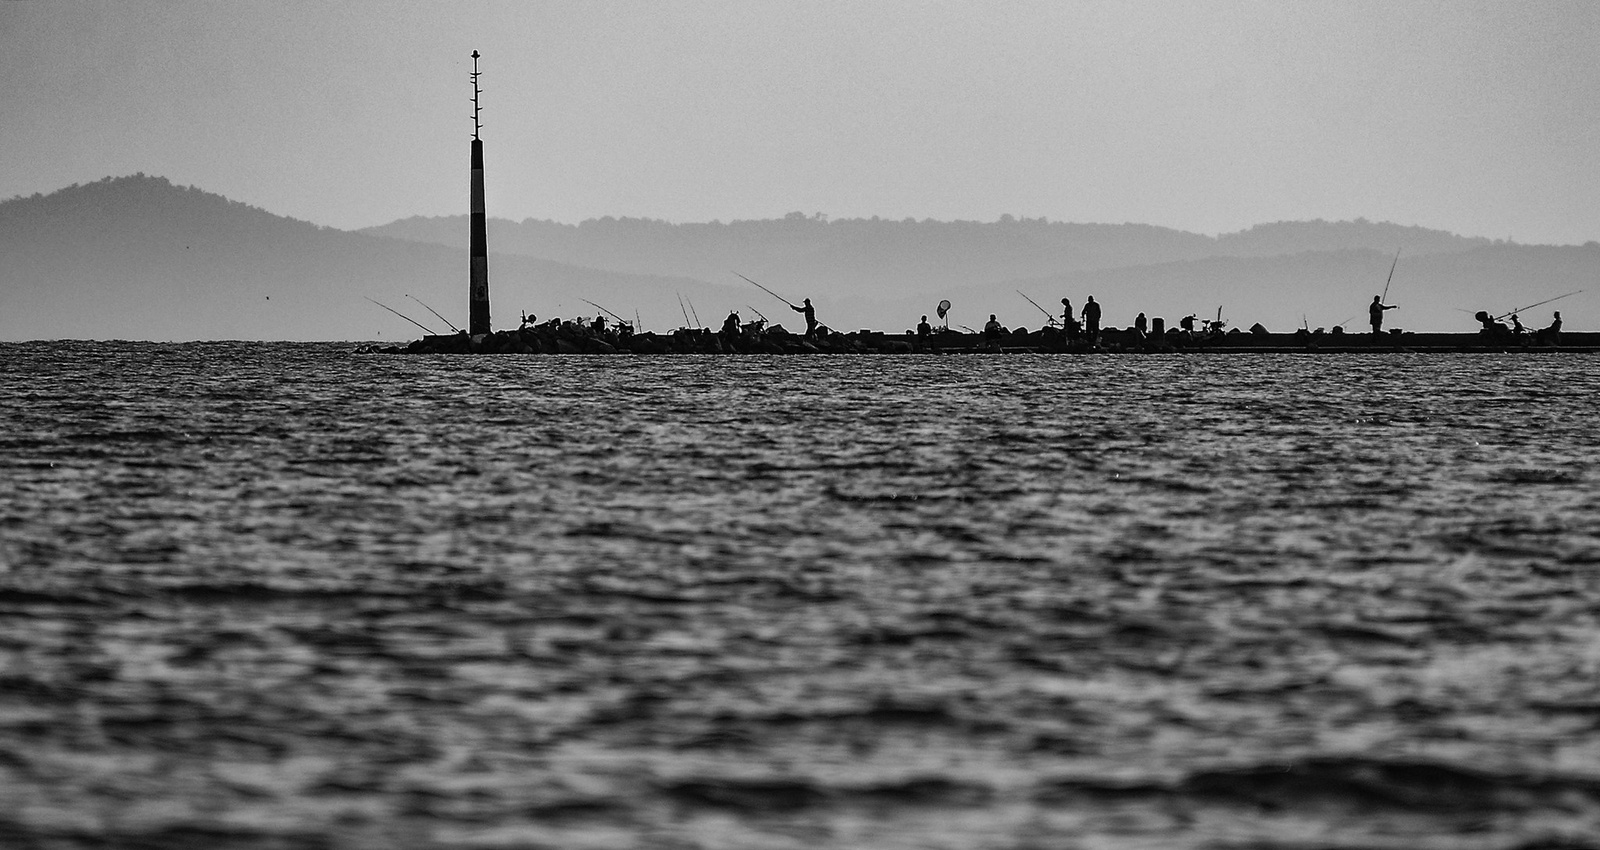 horgászok hajnalbanFFFF